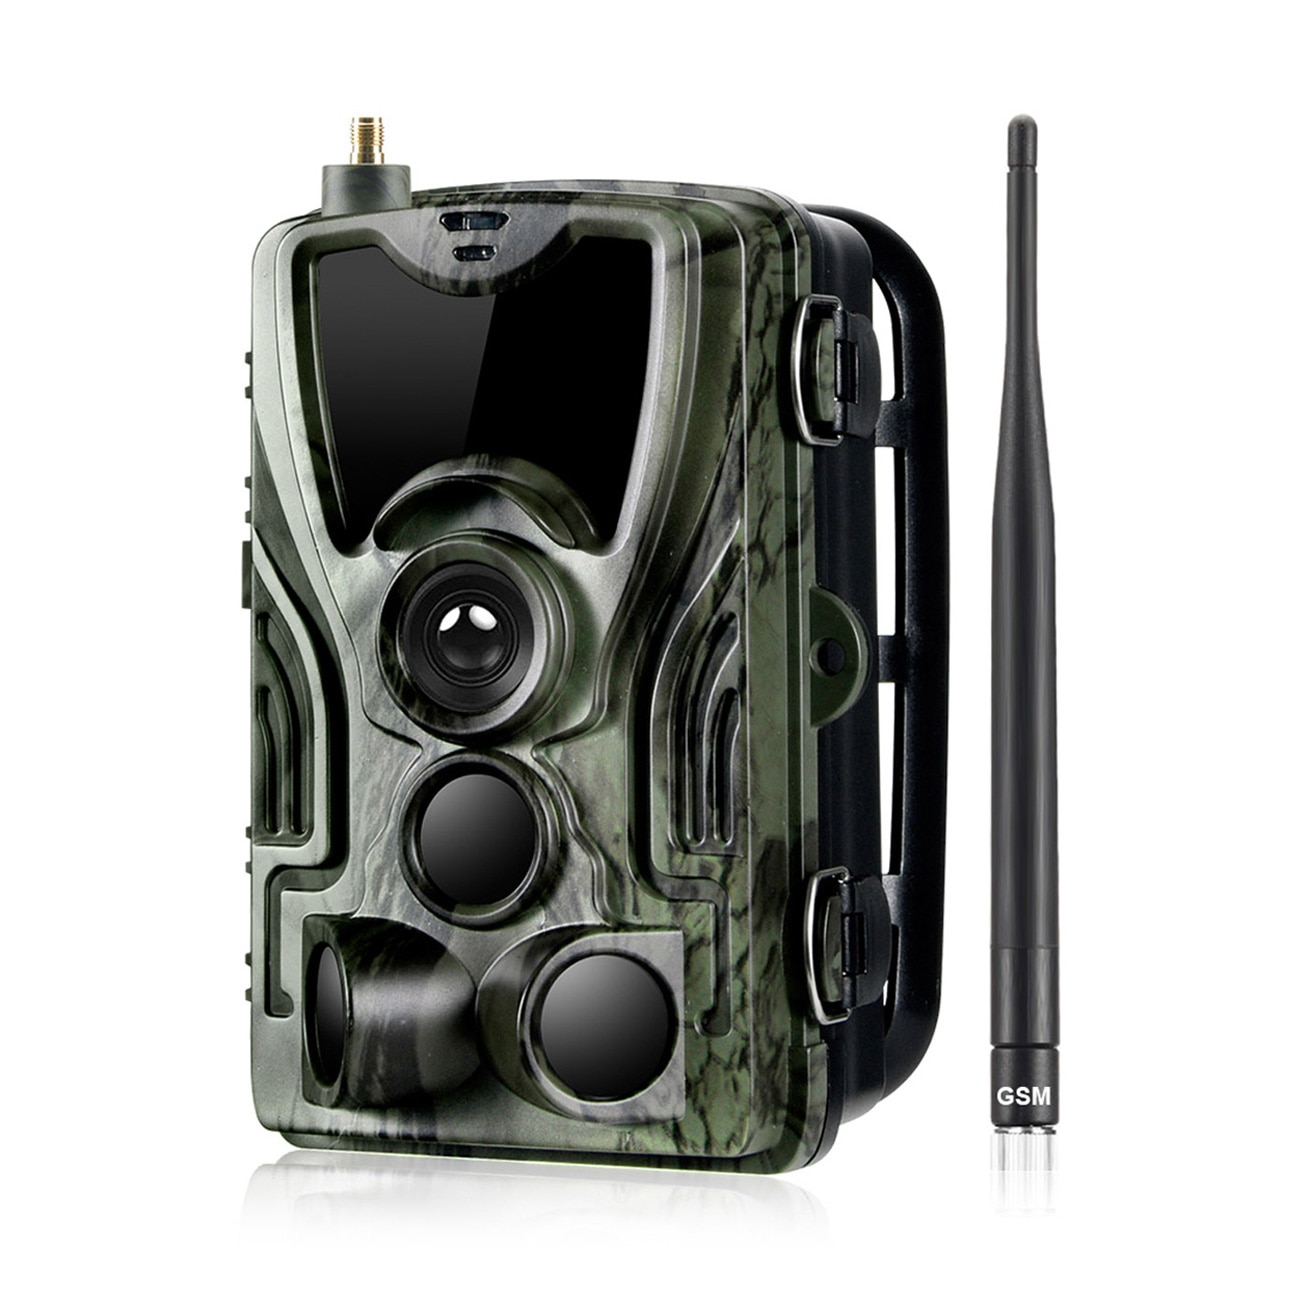 HC801M 2G Hunting Trail Camera 16MP 1080P MMS/SMTP/SMS Wildlife Camera 0.3s Trigger Photo Traps Night Vision Hunter Camera